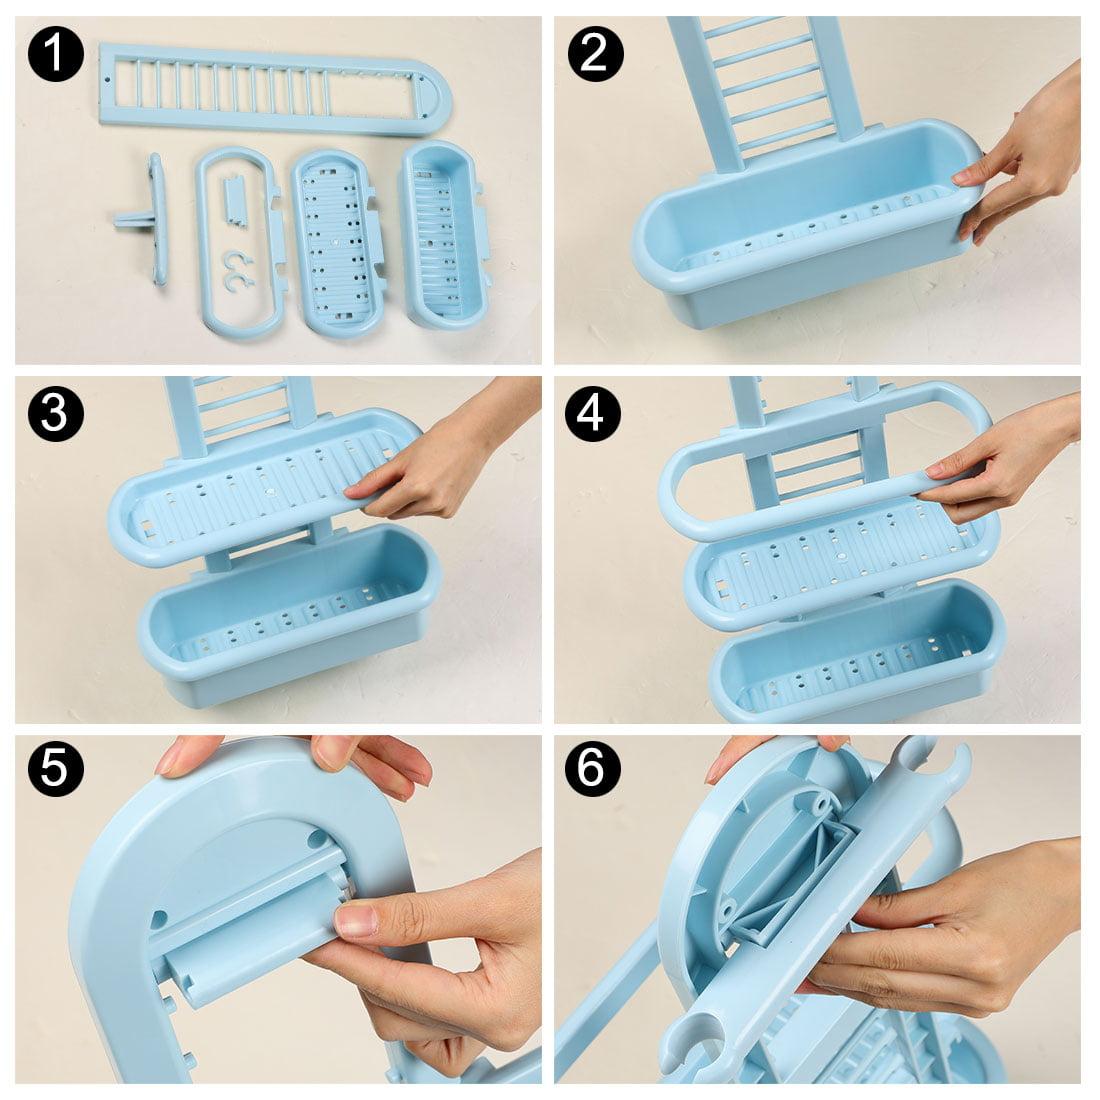 Plastic 3 Tier Hanging Bathroom Tub Shower Shelf Organizer for Bathroom Blue - image 8 of 9